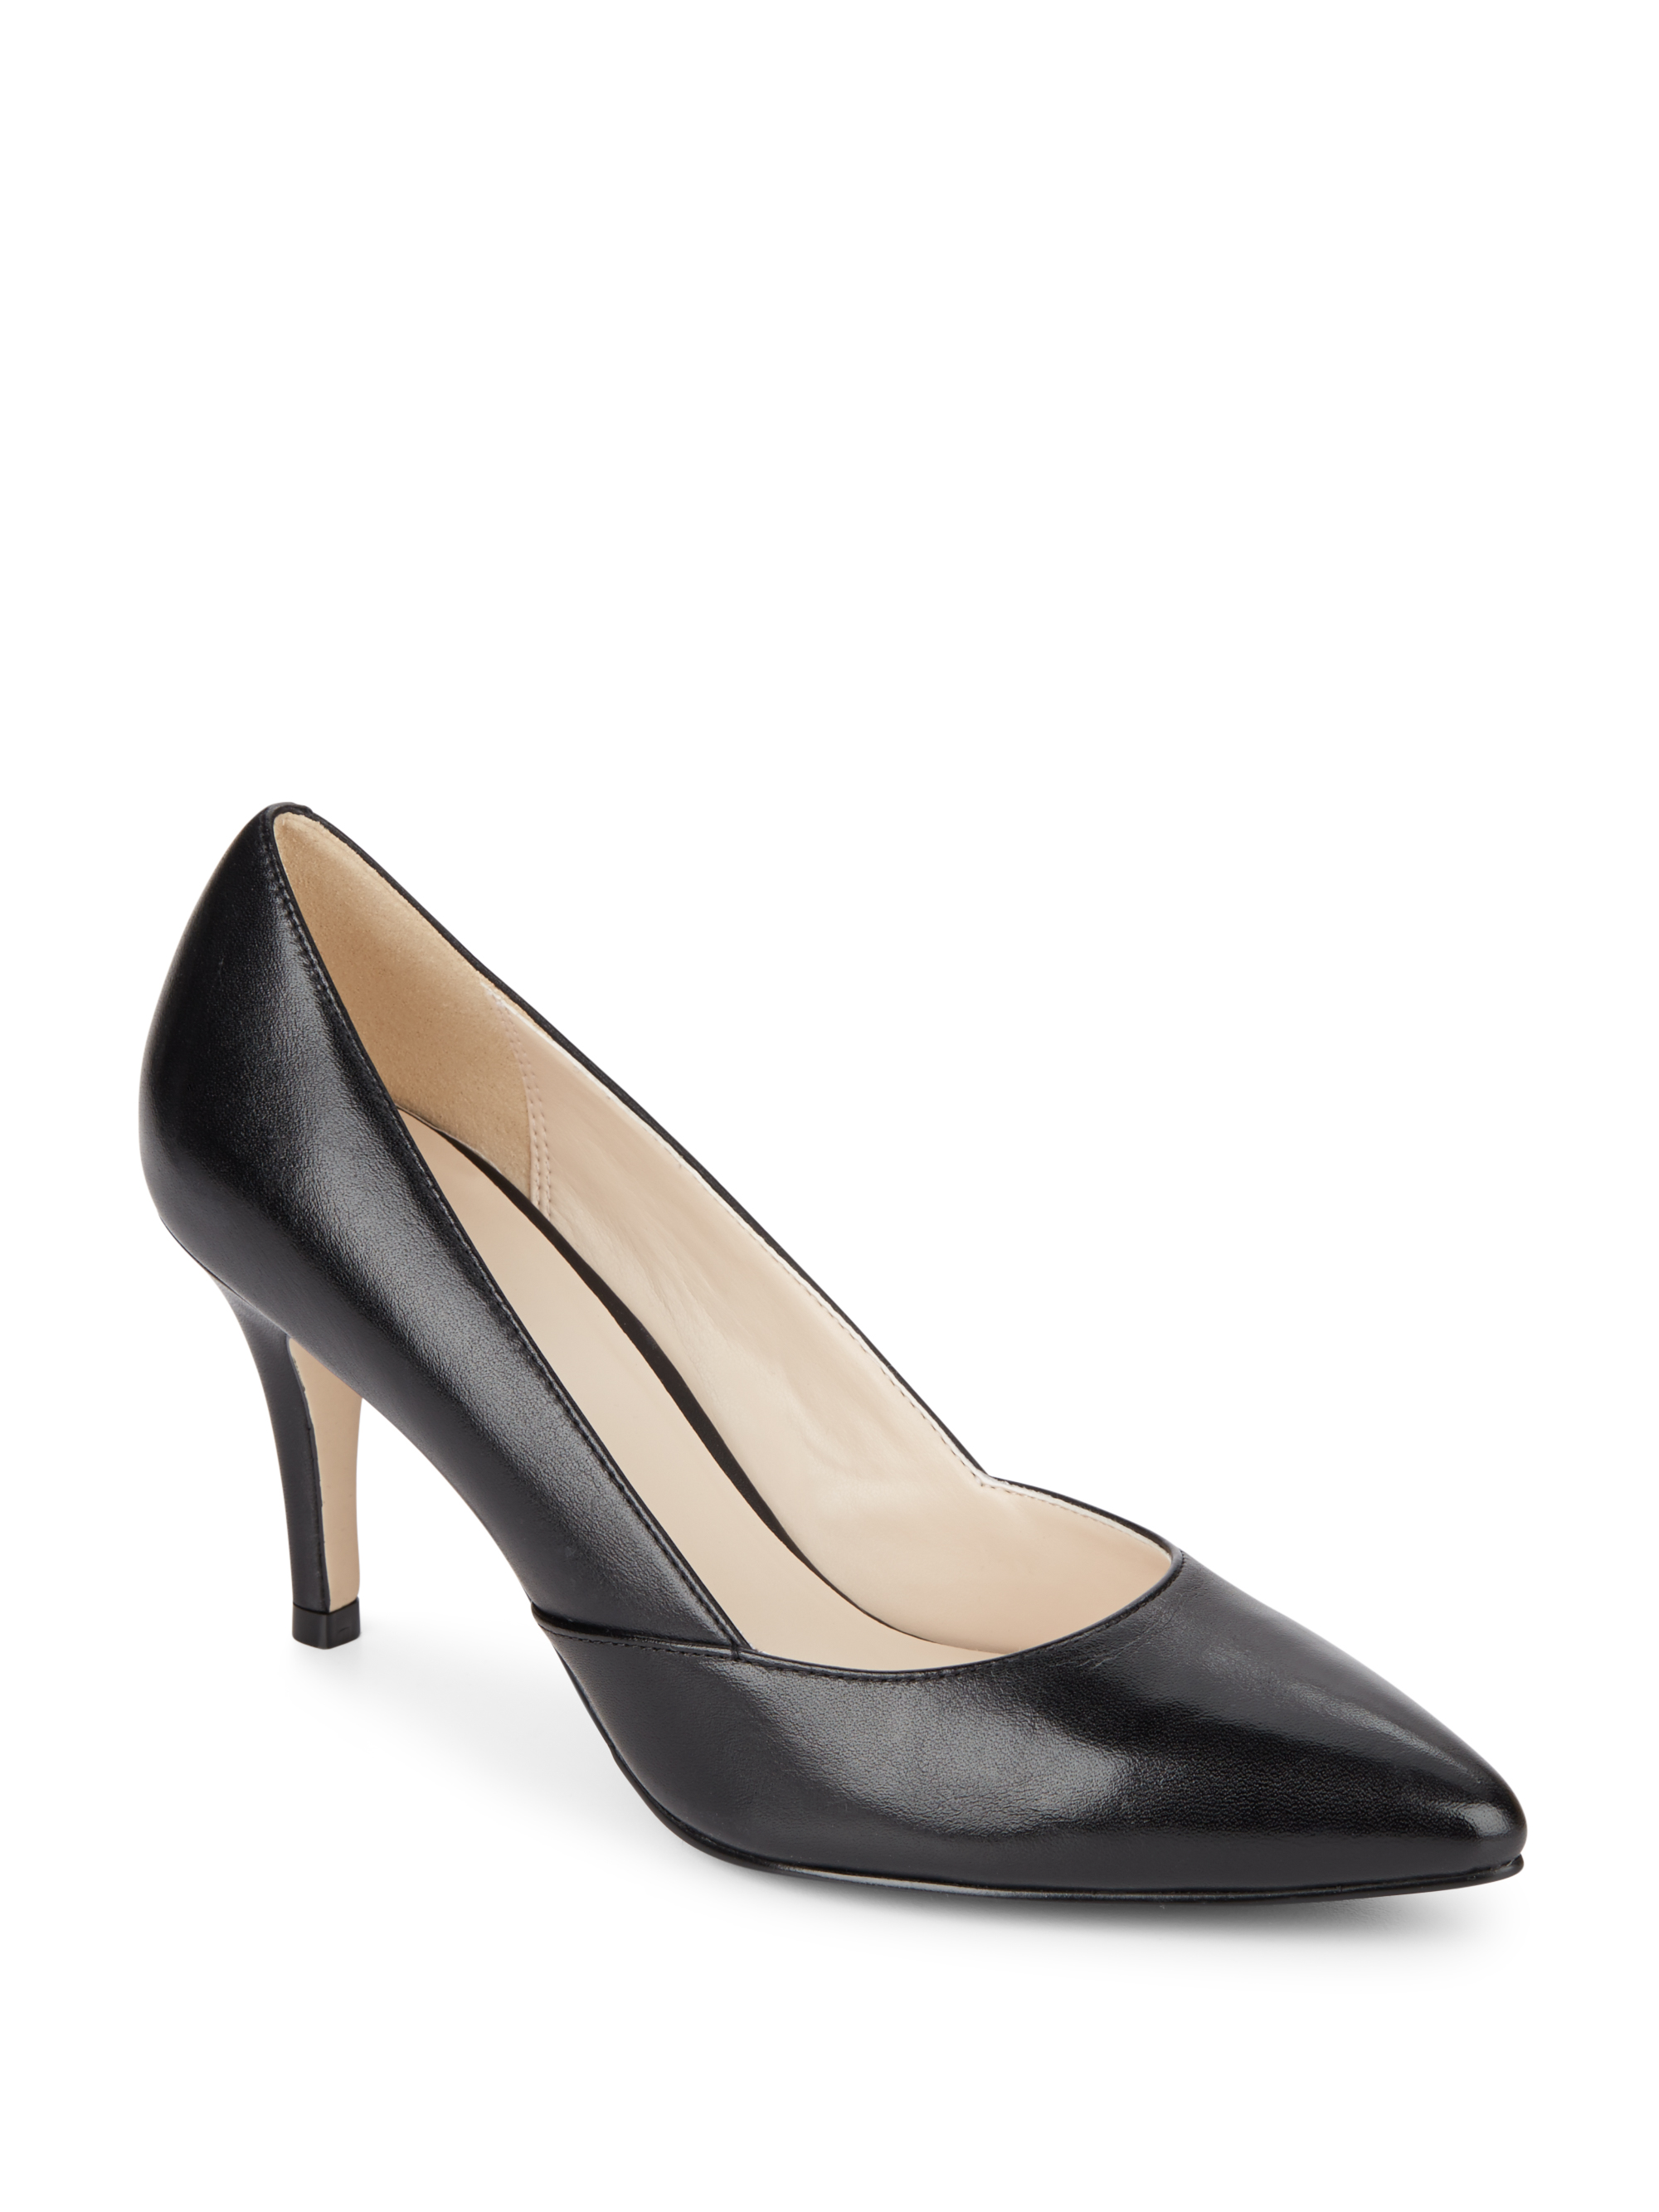 Shoes-057.JPG